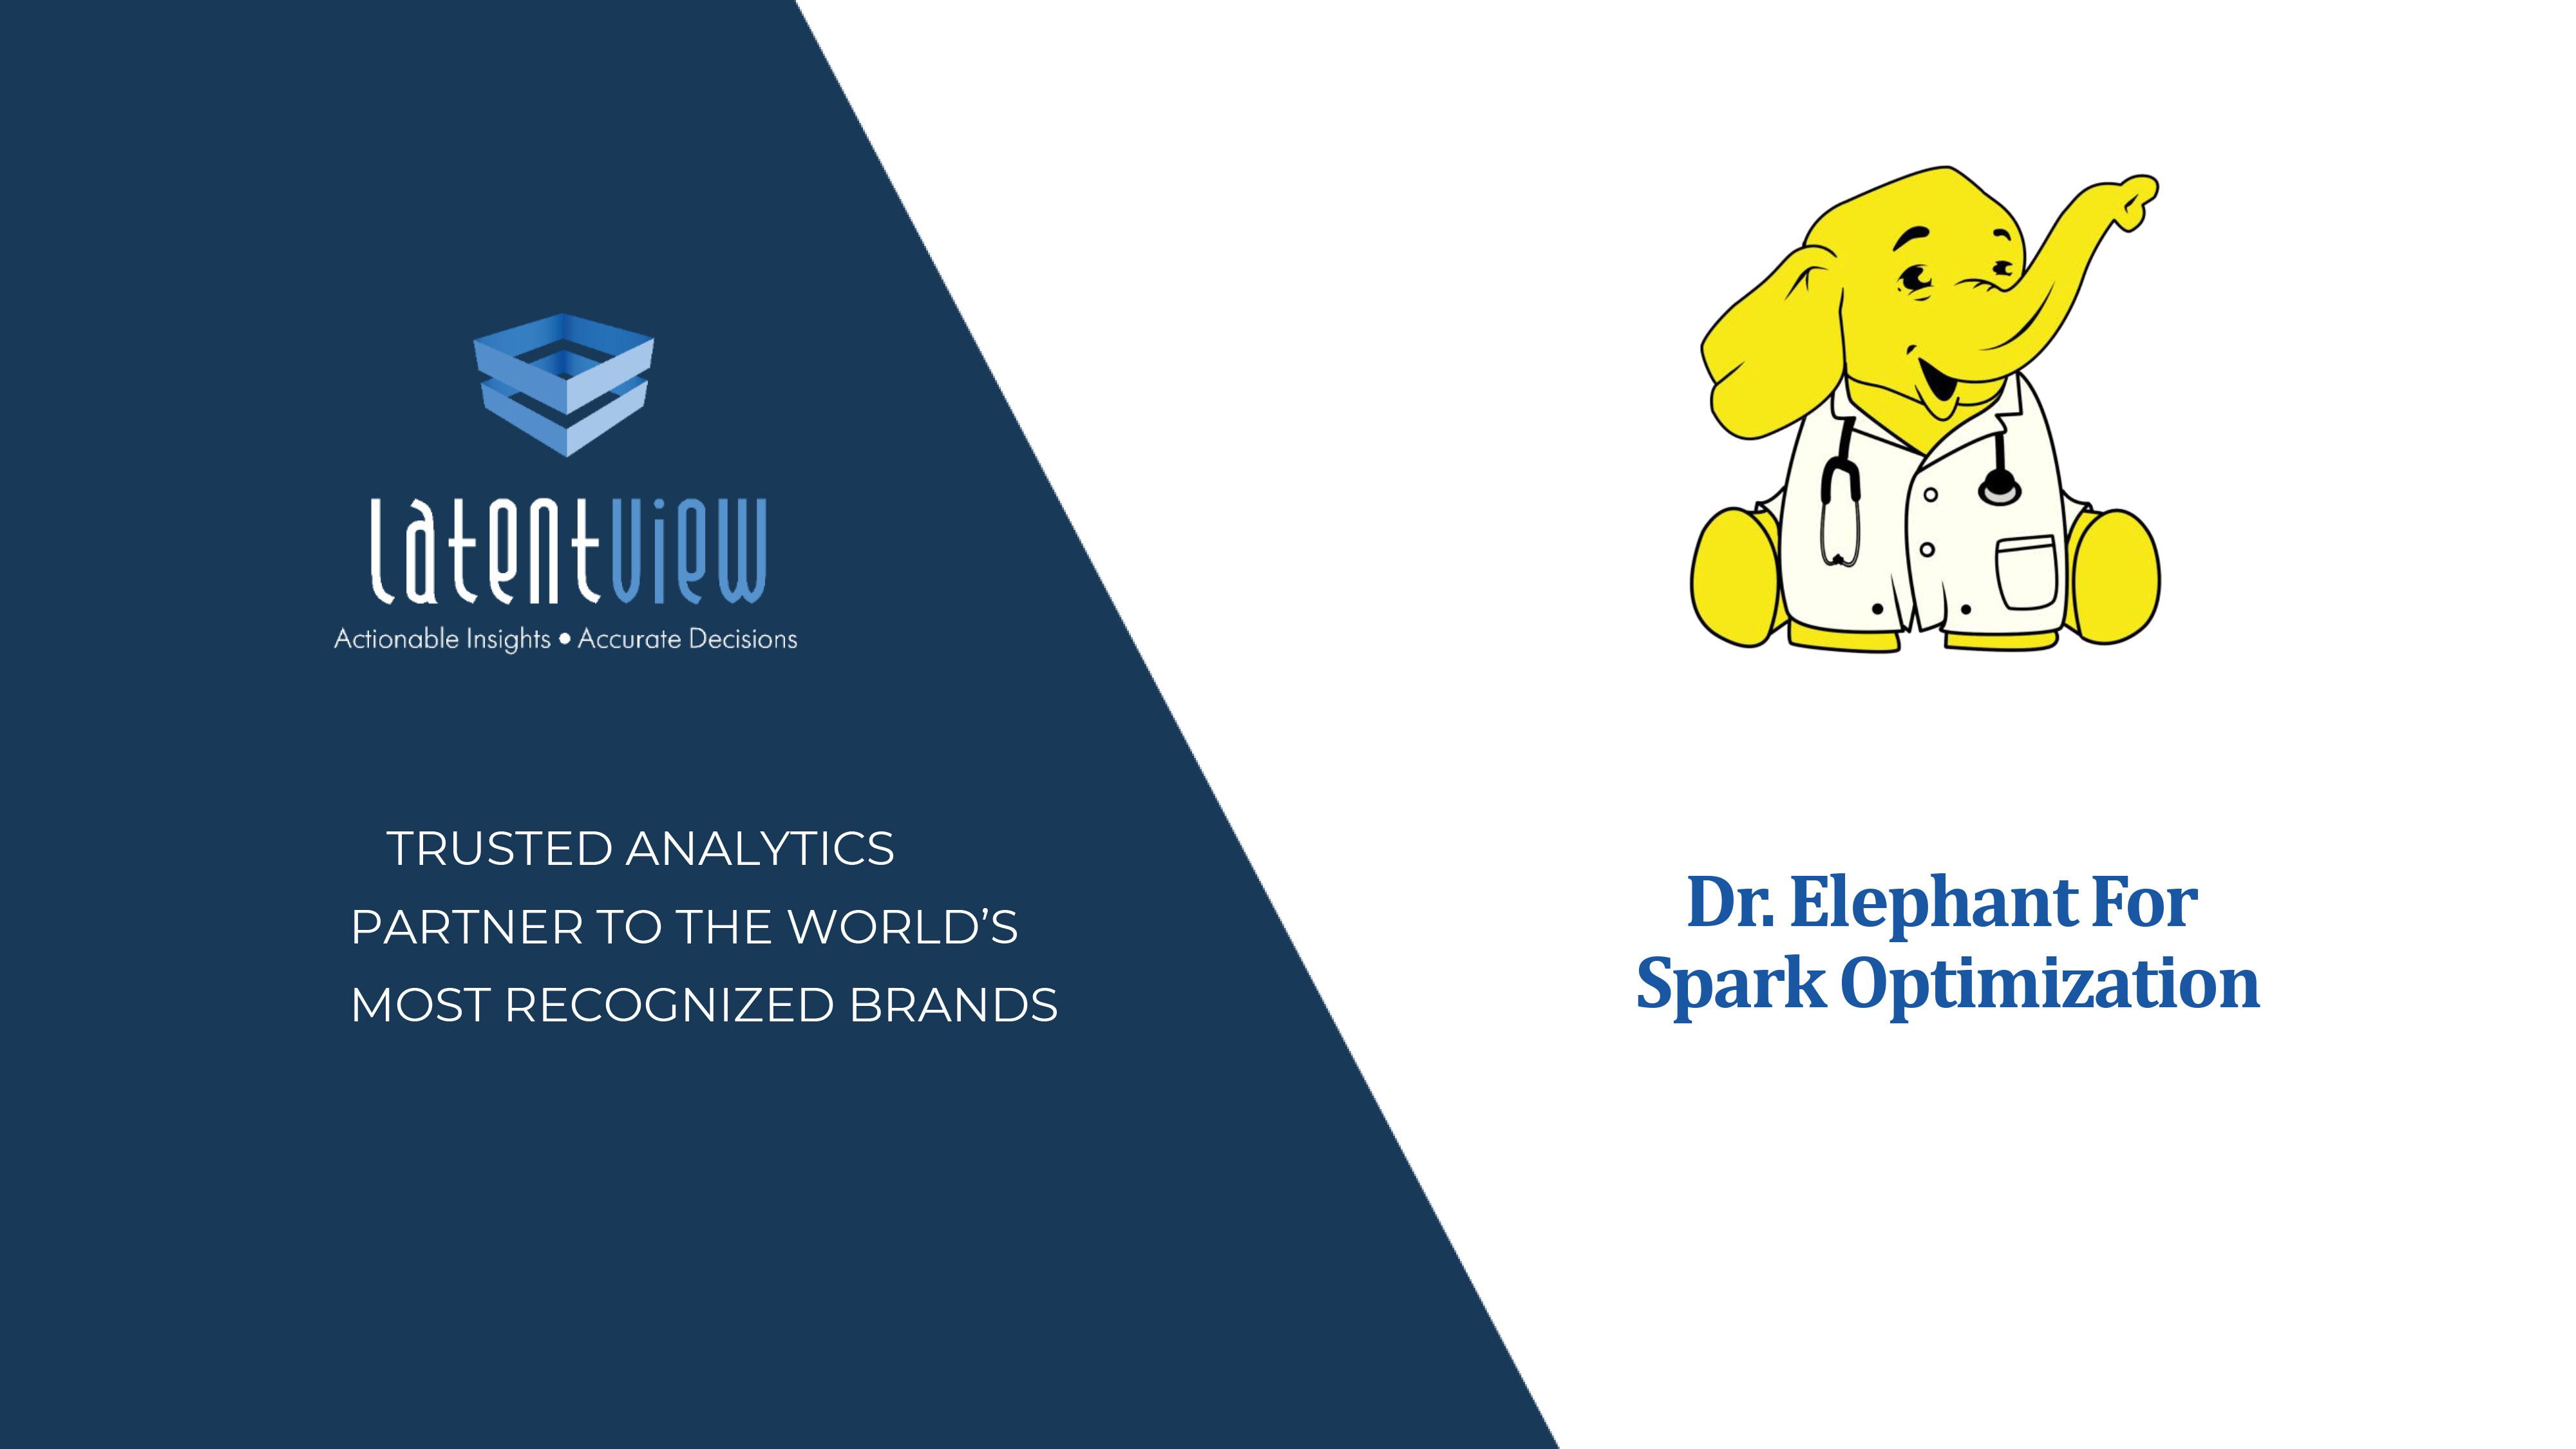 spark optimization dr elephant 1